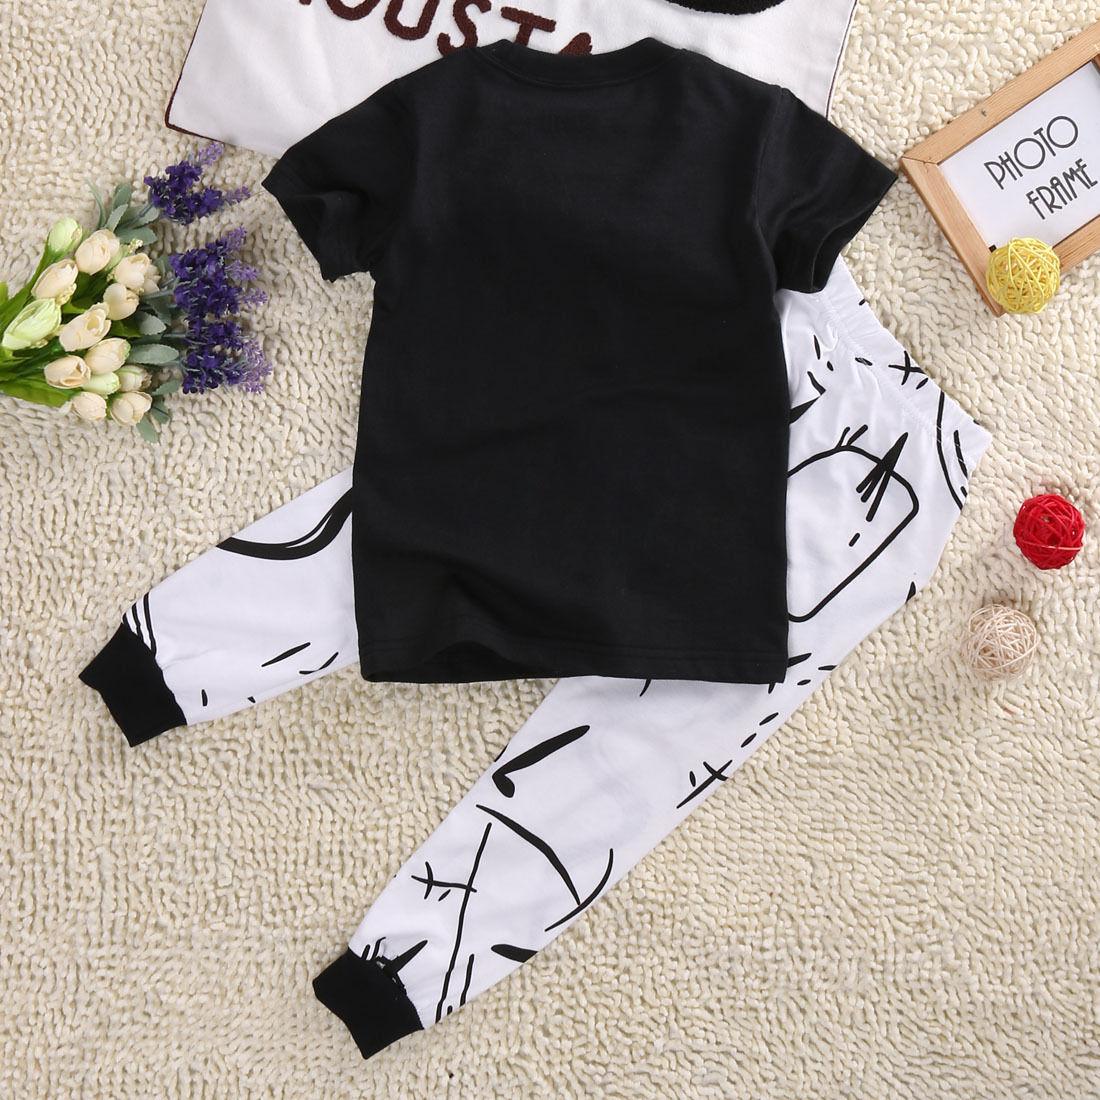 Newborn Infant Kids Baby Girl Floral T-shirt Tops+Long Pants 2PCS Outfit Clothes